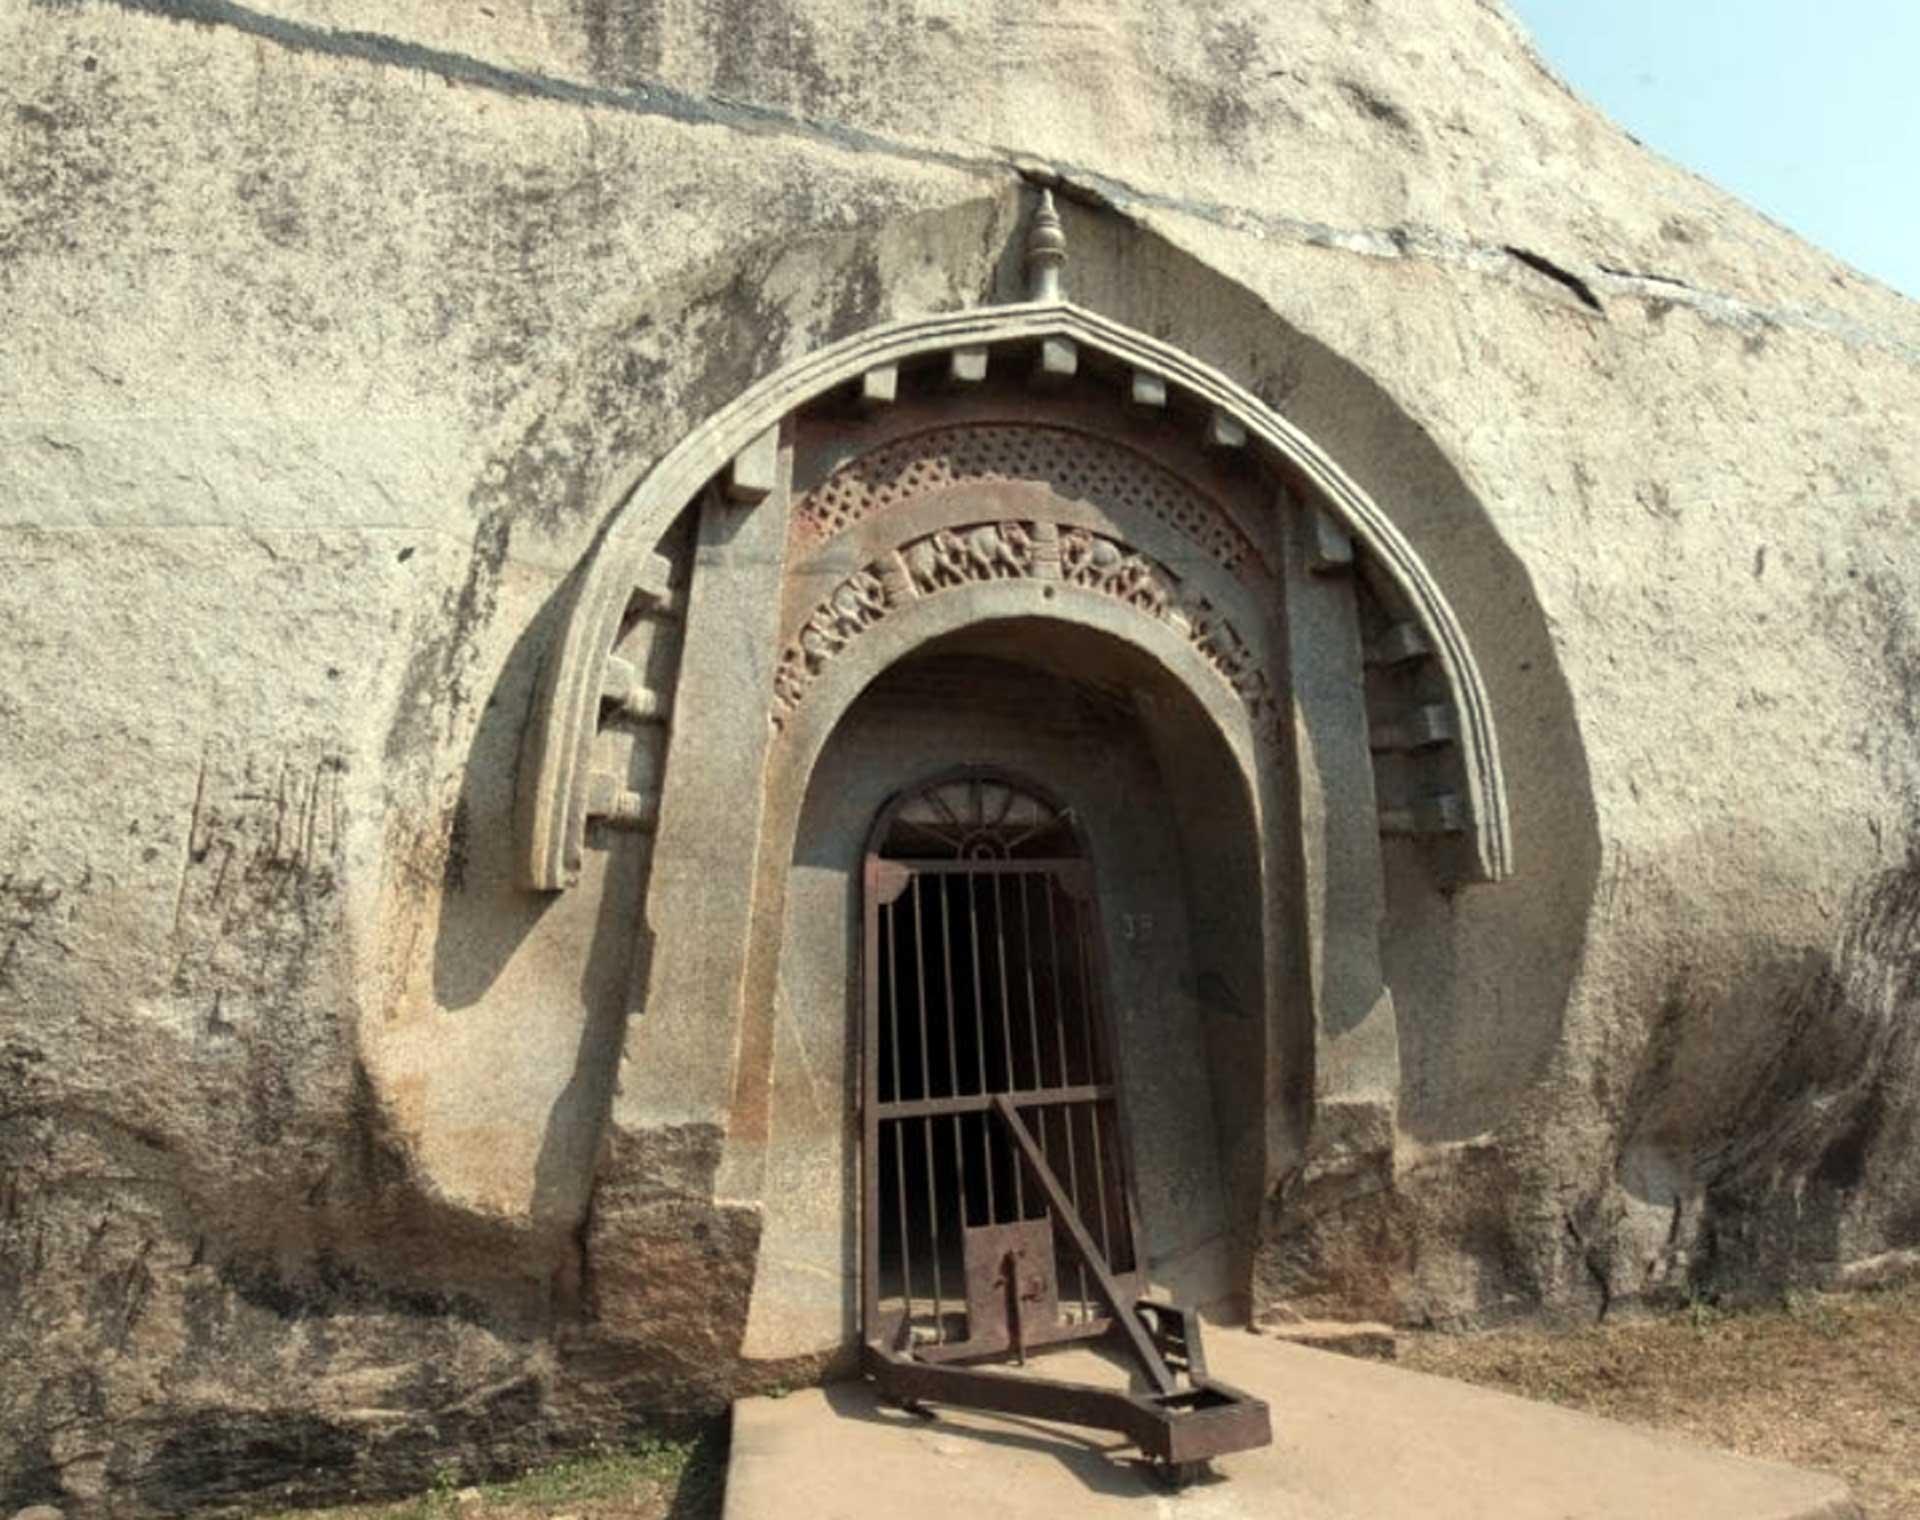 Barabar-BAM-film-granit-miroir-pyramide-inde-yoga-archeologie-livre-barabar-1920-1520